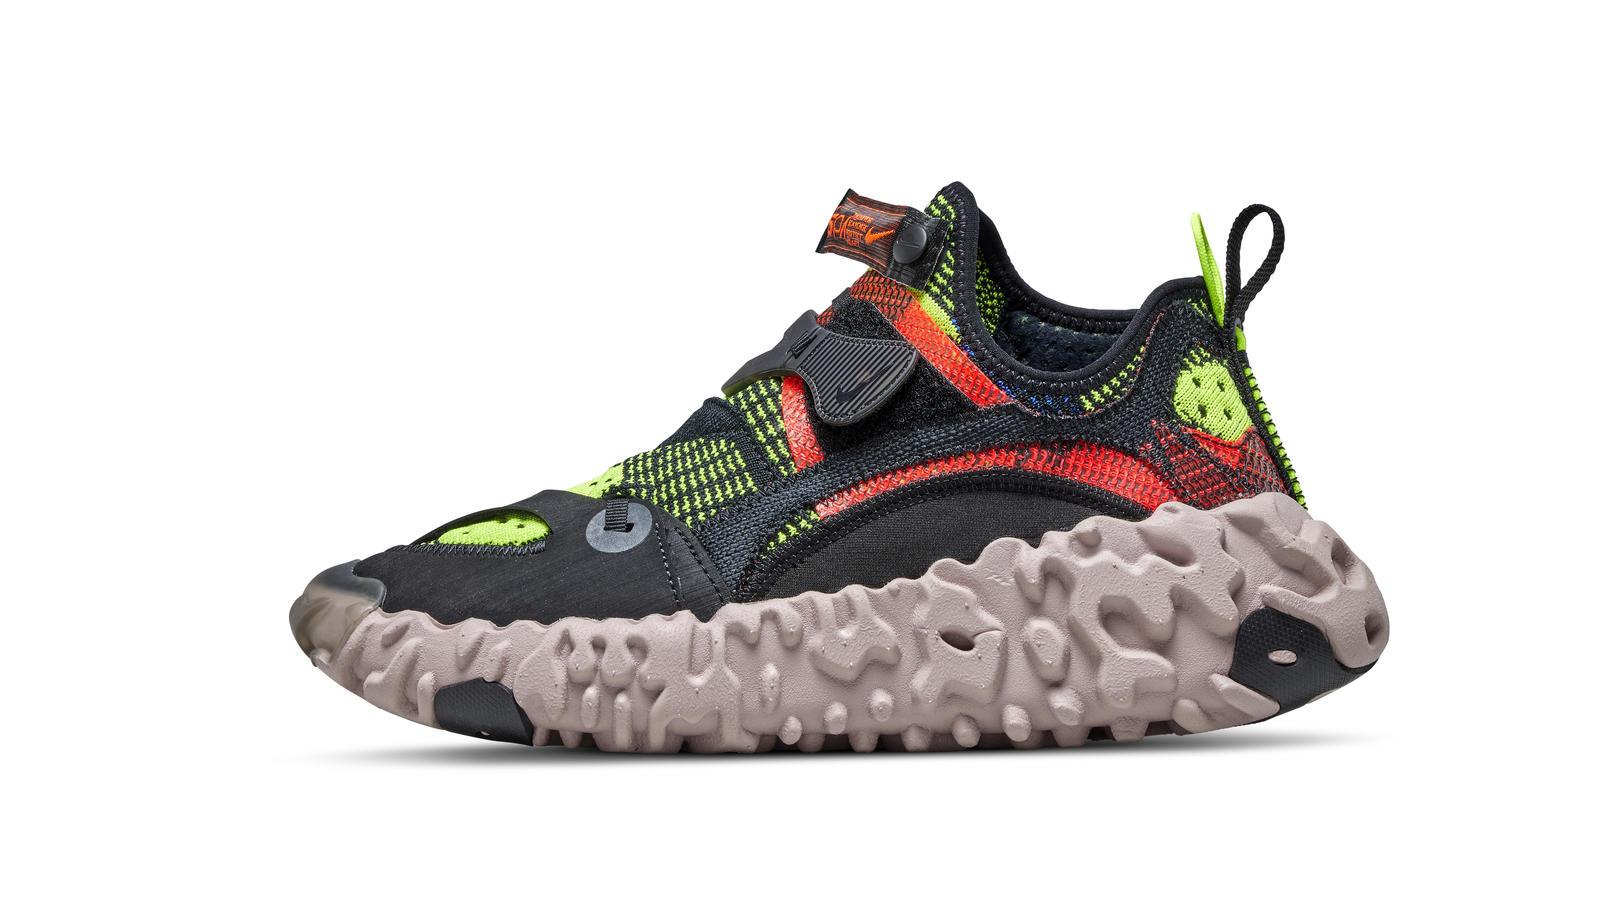 Nike ISPA 2020 Preview 14